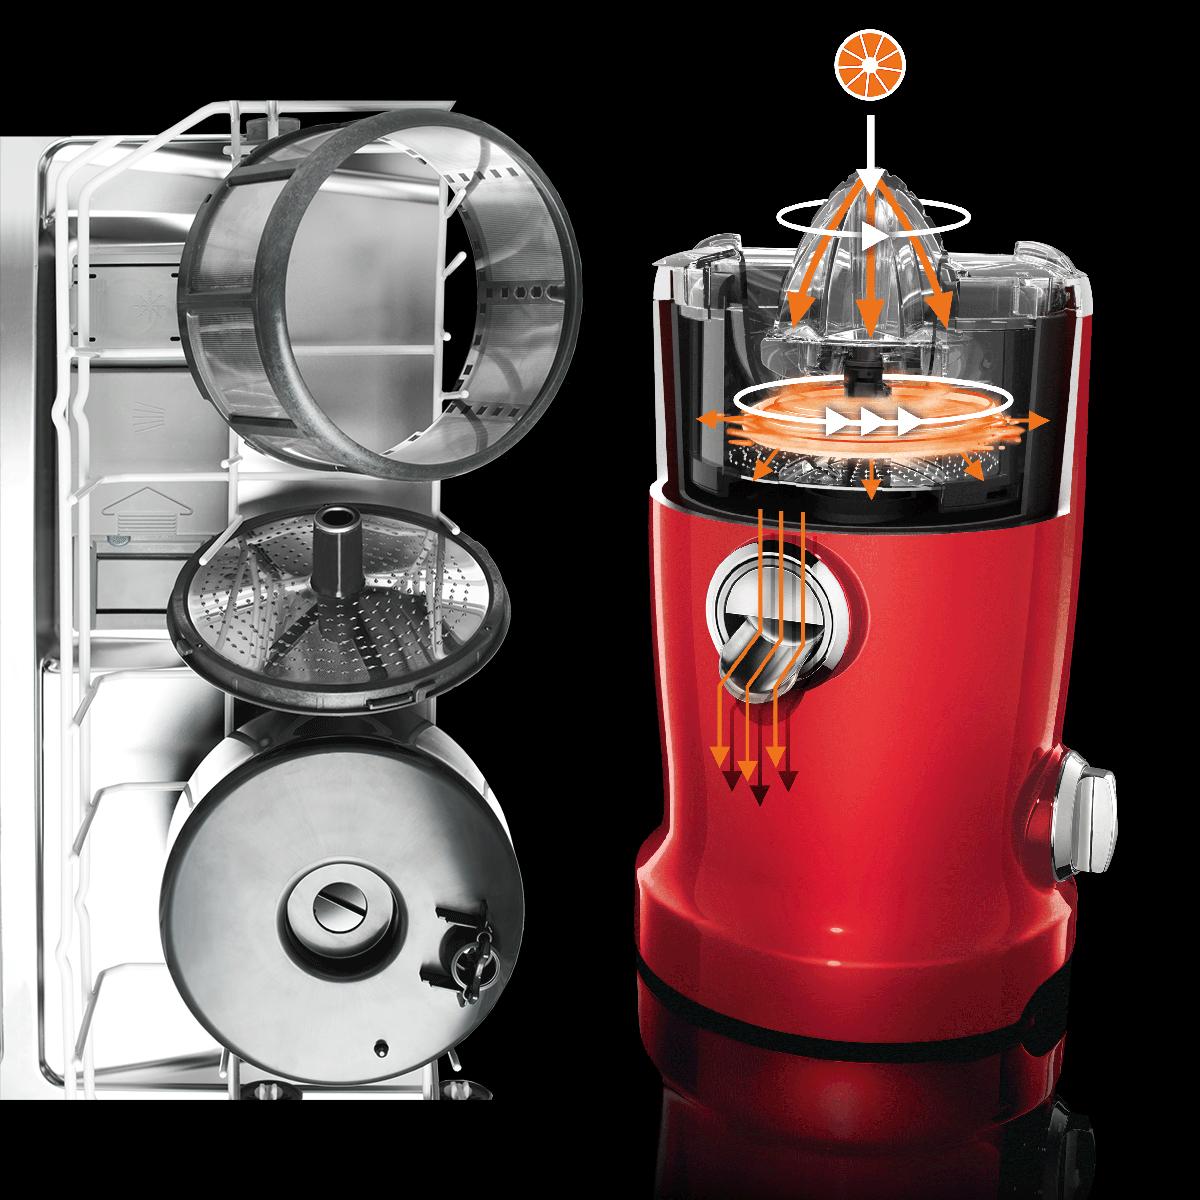 Novis Vita Juicer Black 4-in-1 Multi-Function Electric Juicer